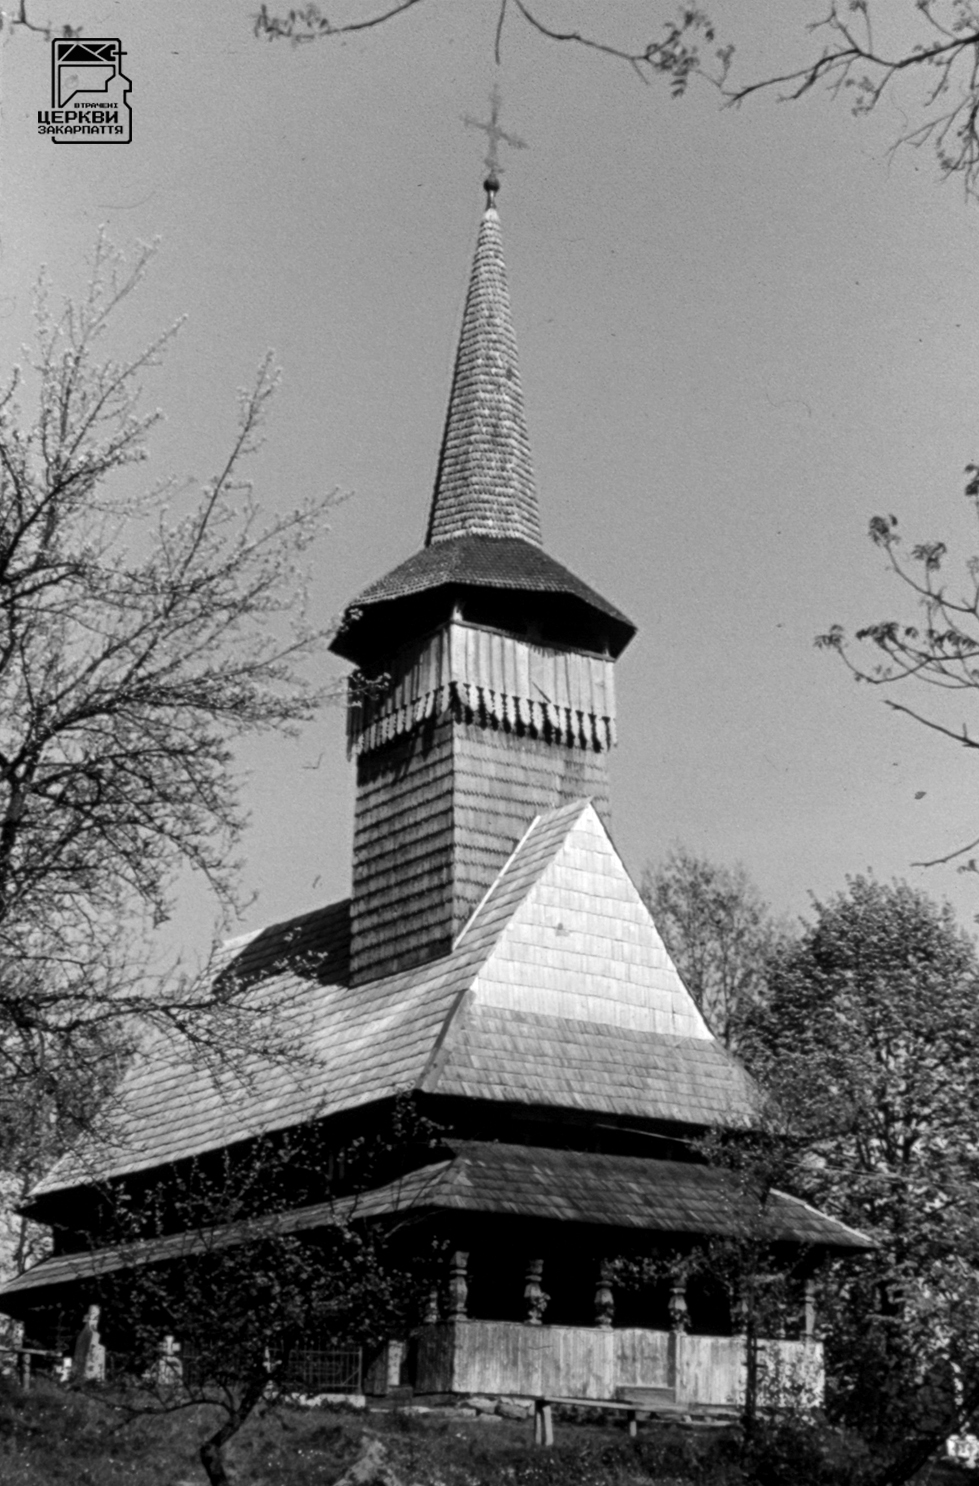 Греко-католицька церква св. арх. Михаїла, НЕРЕСНИЦЯ, село